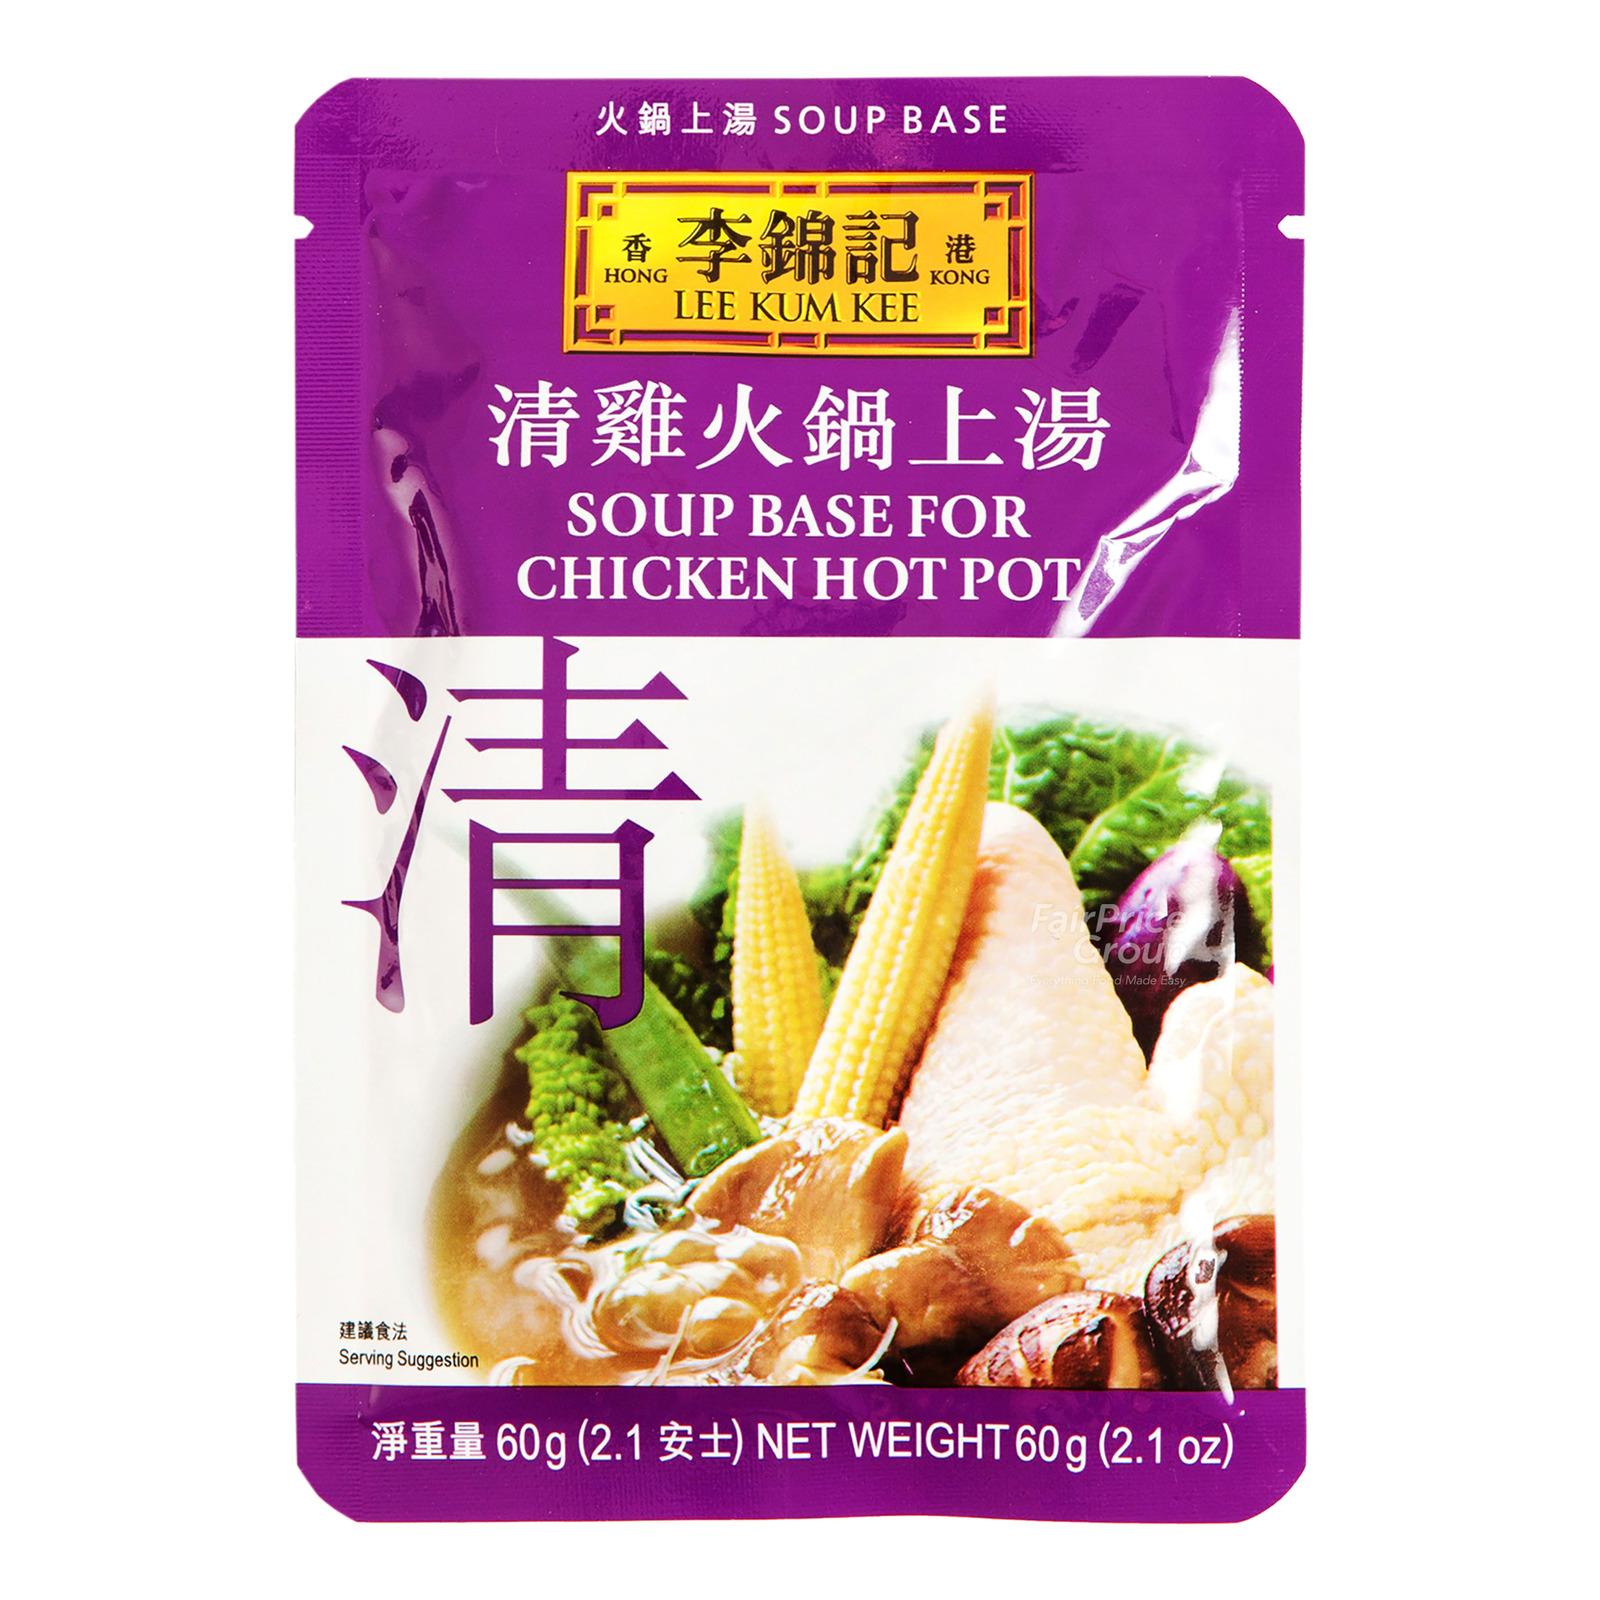 Lee Kum Kee Soup Base for Hot Pot - Chicken